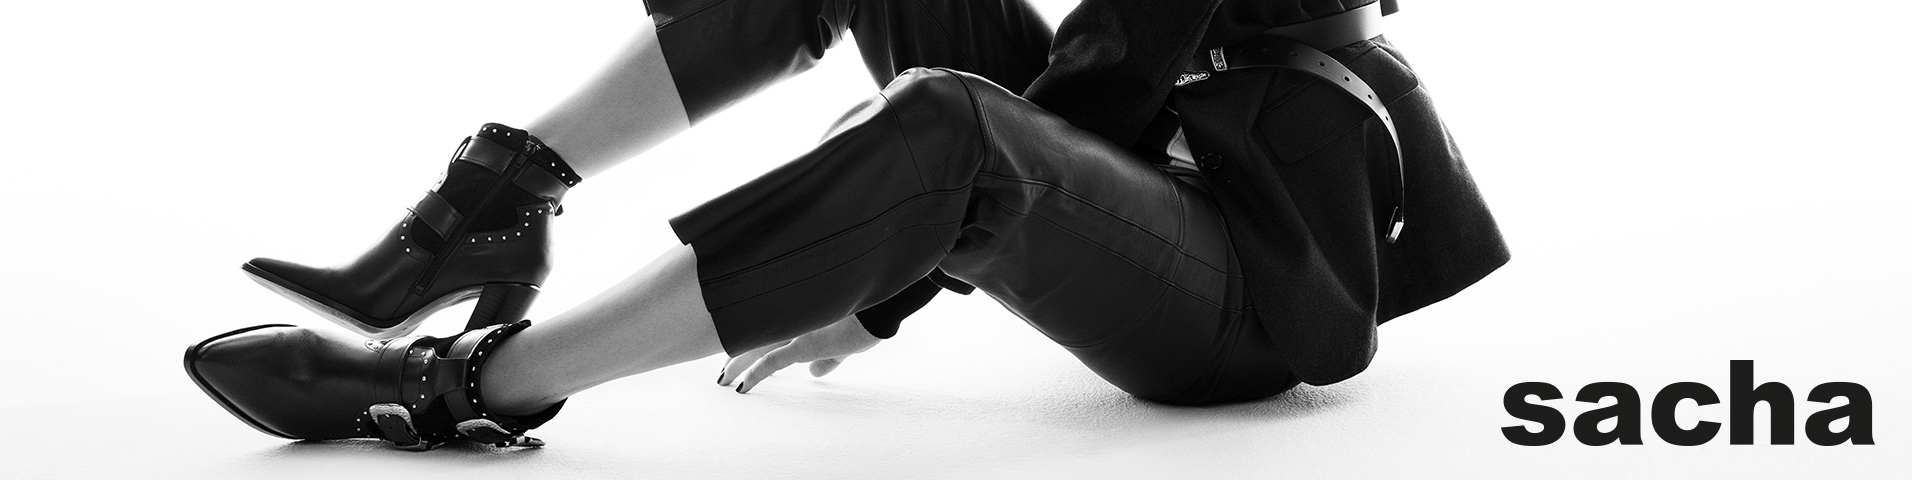 Sacha Sneaker online kaufen   Mach s dir bequem   ZALANDO 86ce3fab04